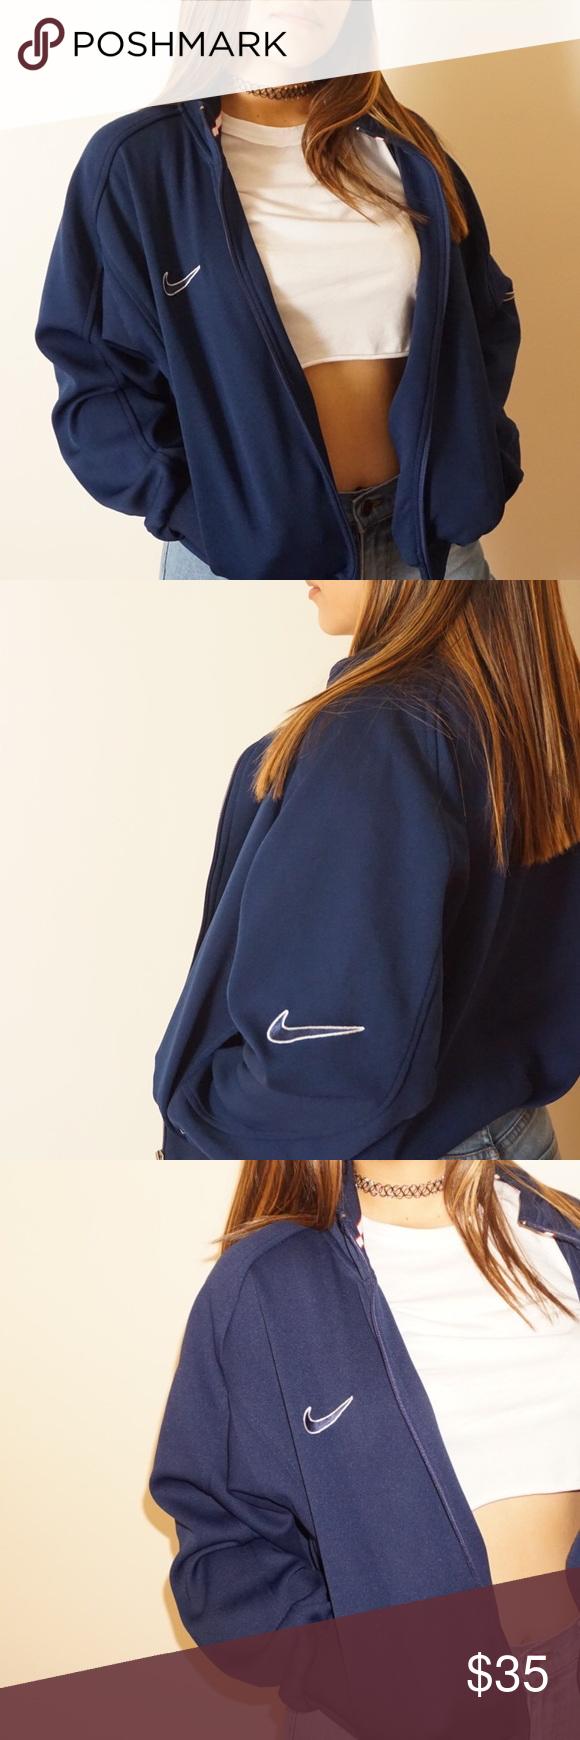 a9f1ba25c Vintage Nike Jacket Navy blue VINTAGE Nike Jacket! In beautiful condition! Nike  Jackets & Coats